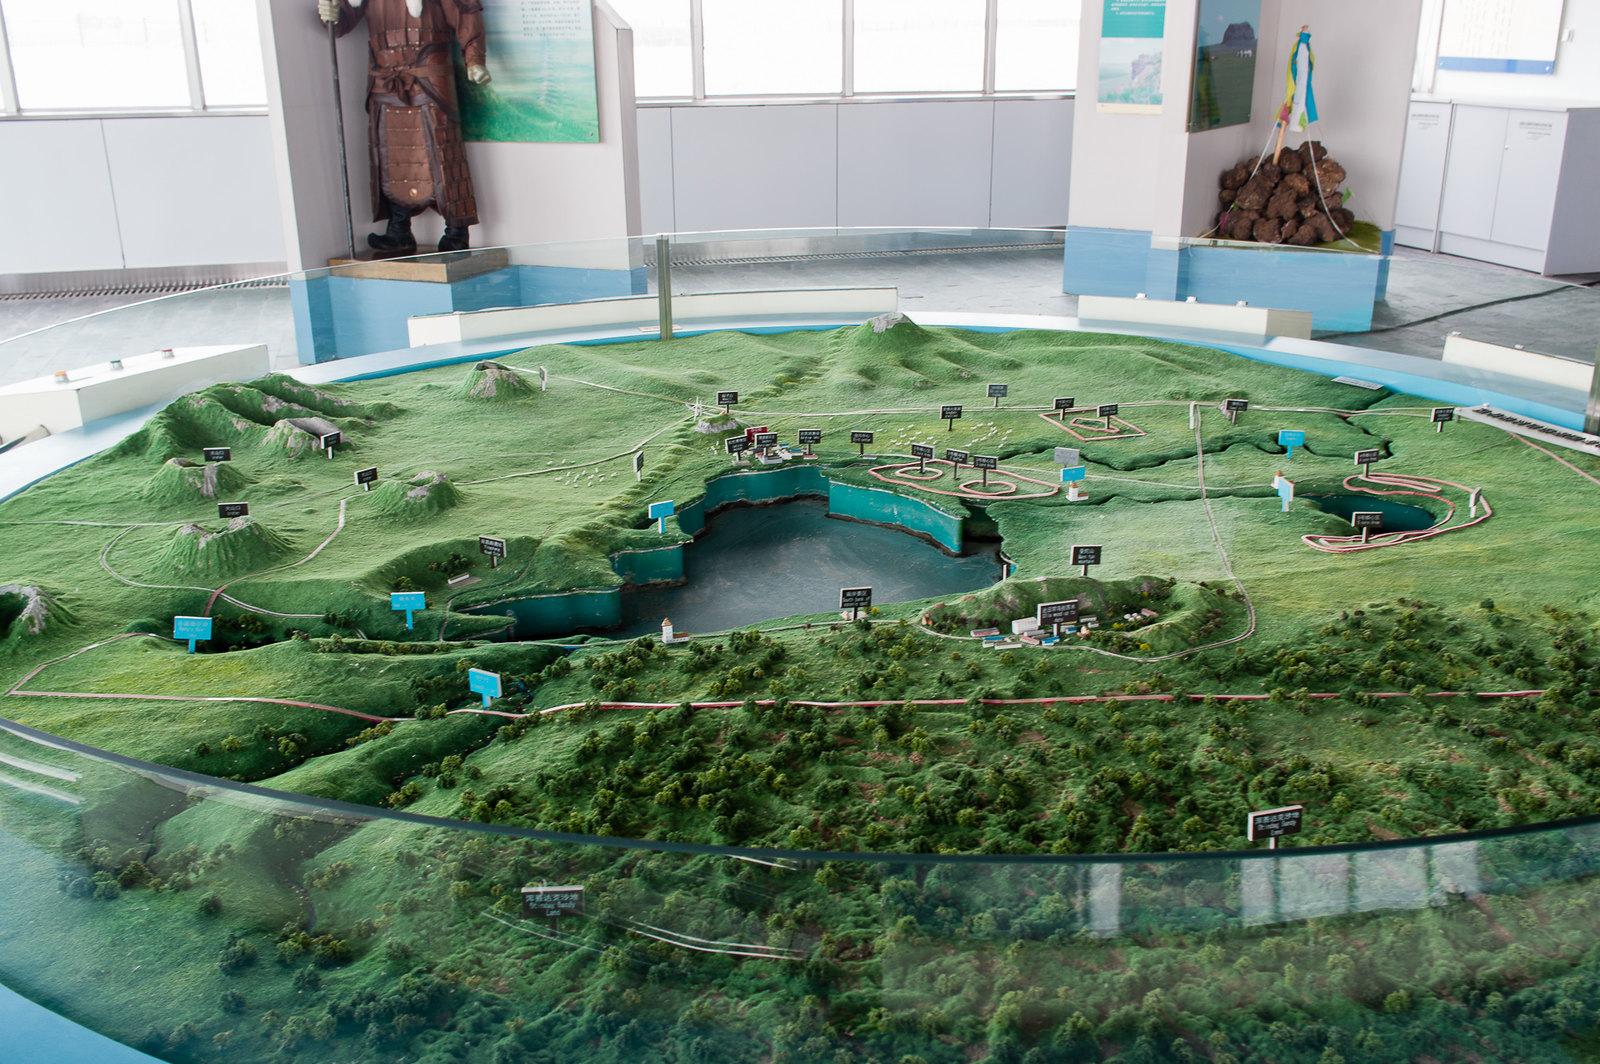 Dalinor Lake Nature Museum